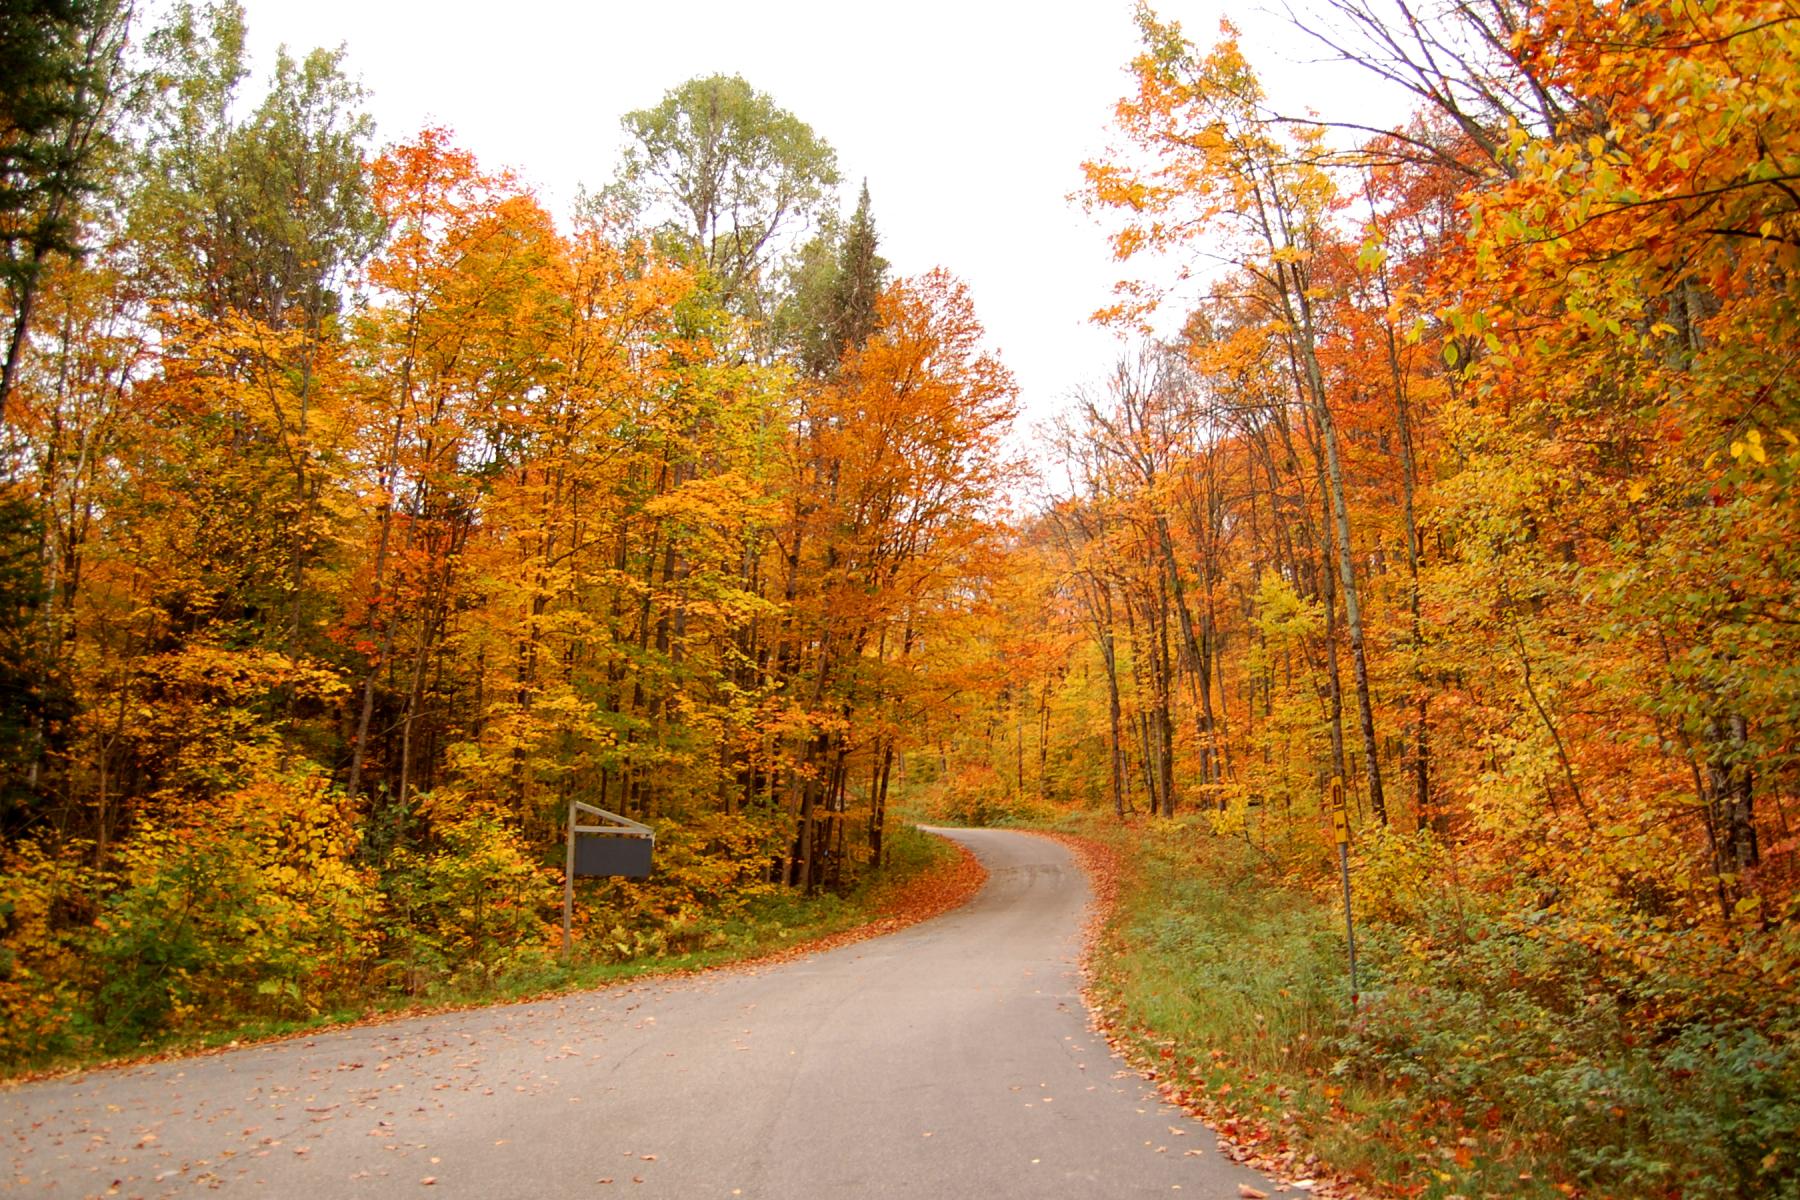 File:Autumn ... Bing History